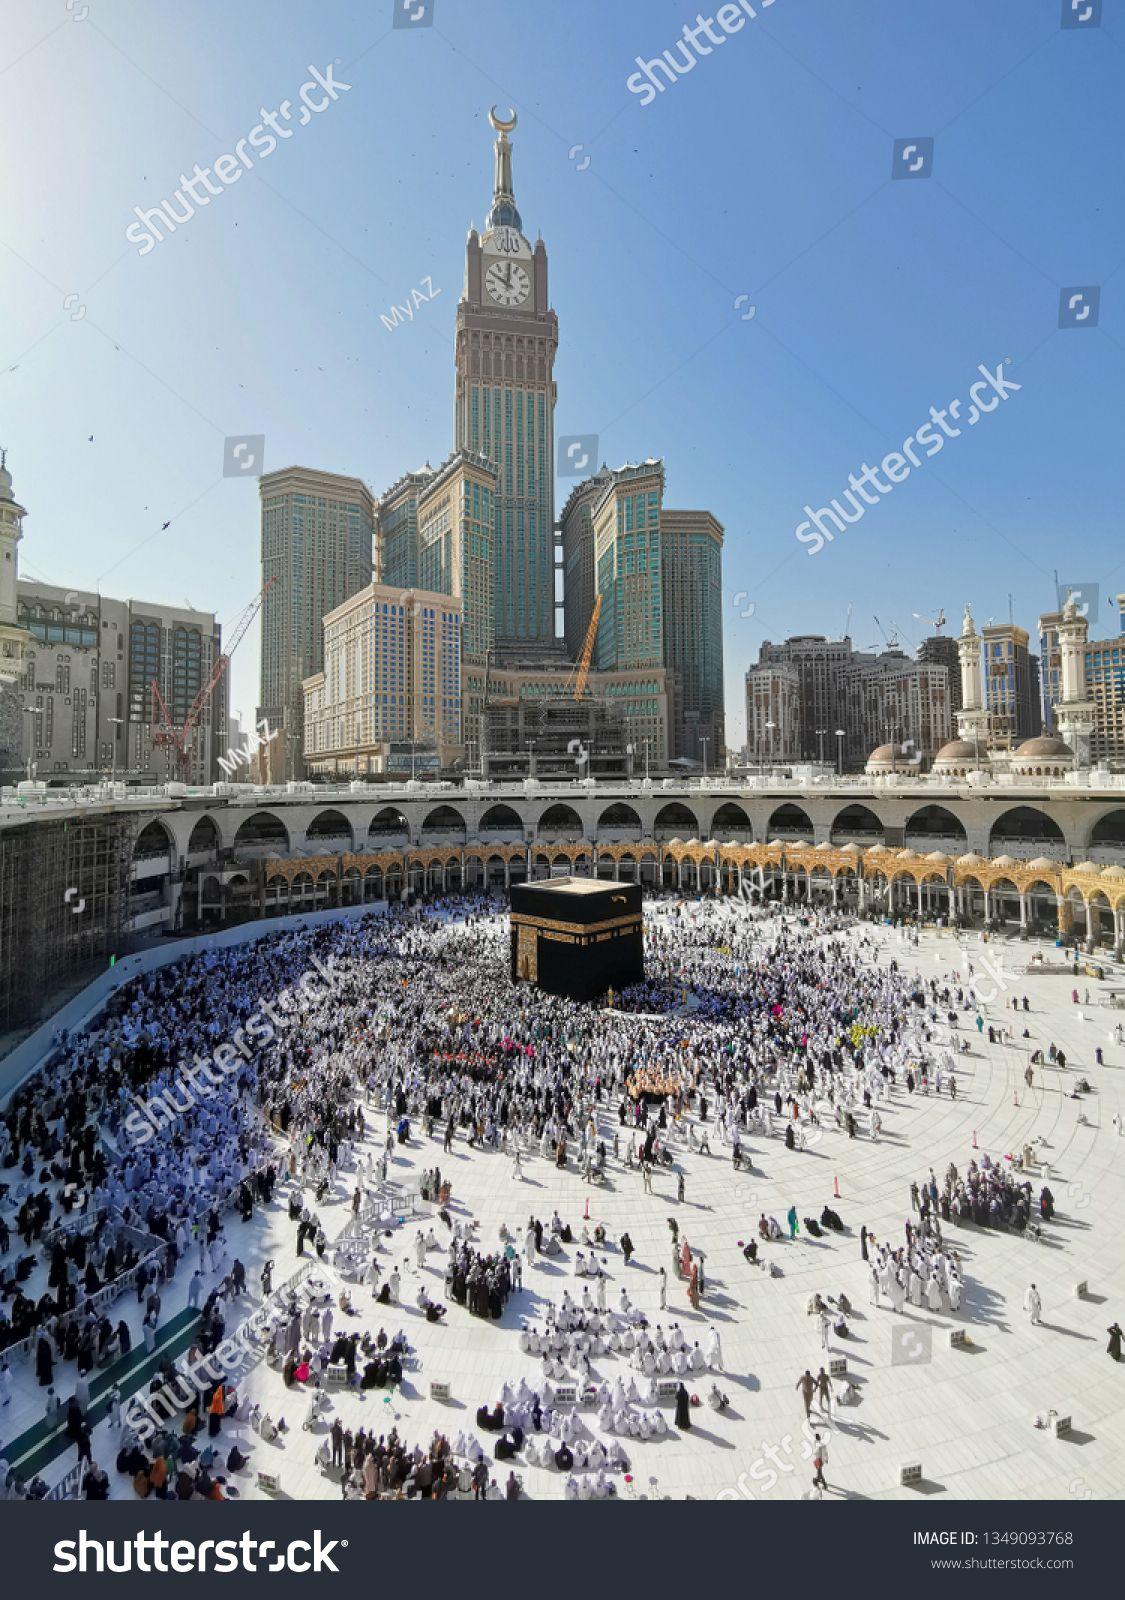 Mecca Saudi Arabia January 2 2017 Unidentified Pilgrims Perform Tawaf Around Kaaba Inside Masjidil Haram M Abstract Photos Stock Photos Photo Backgrounds